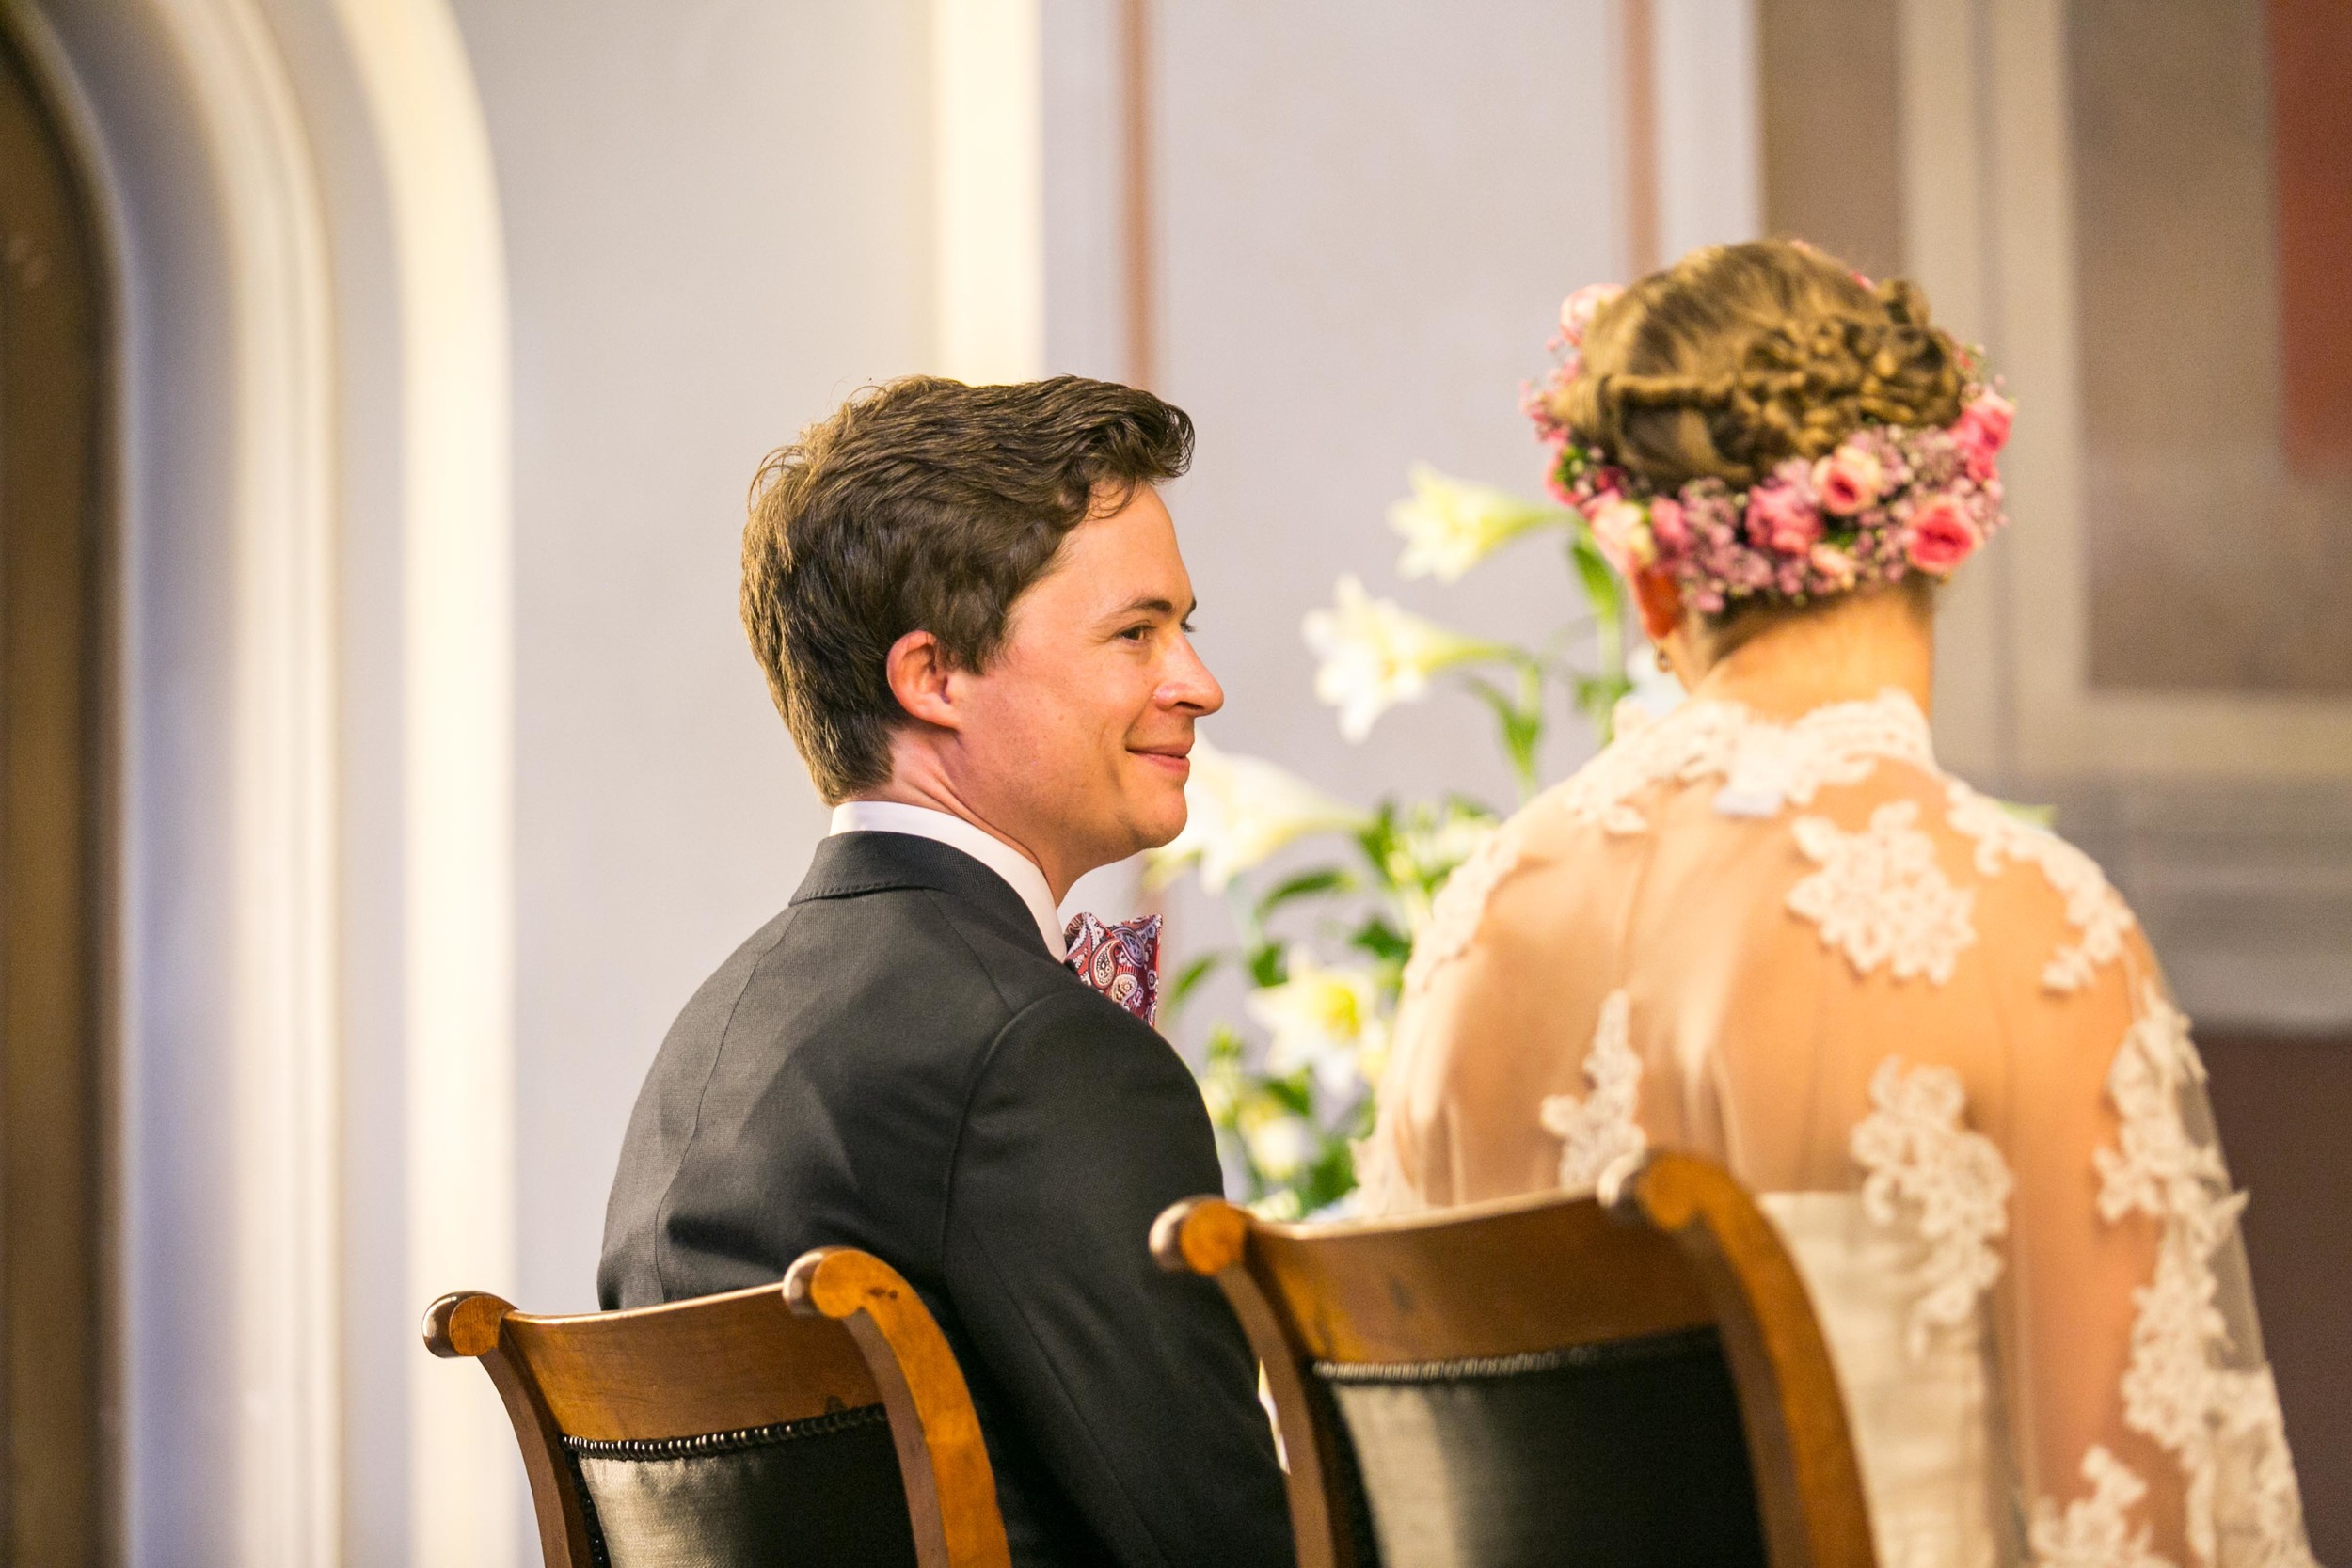 Fran Burrows Berlin Hochzeitsfotografie-21.jpg